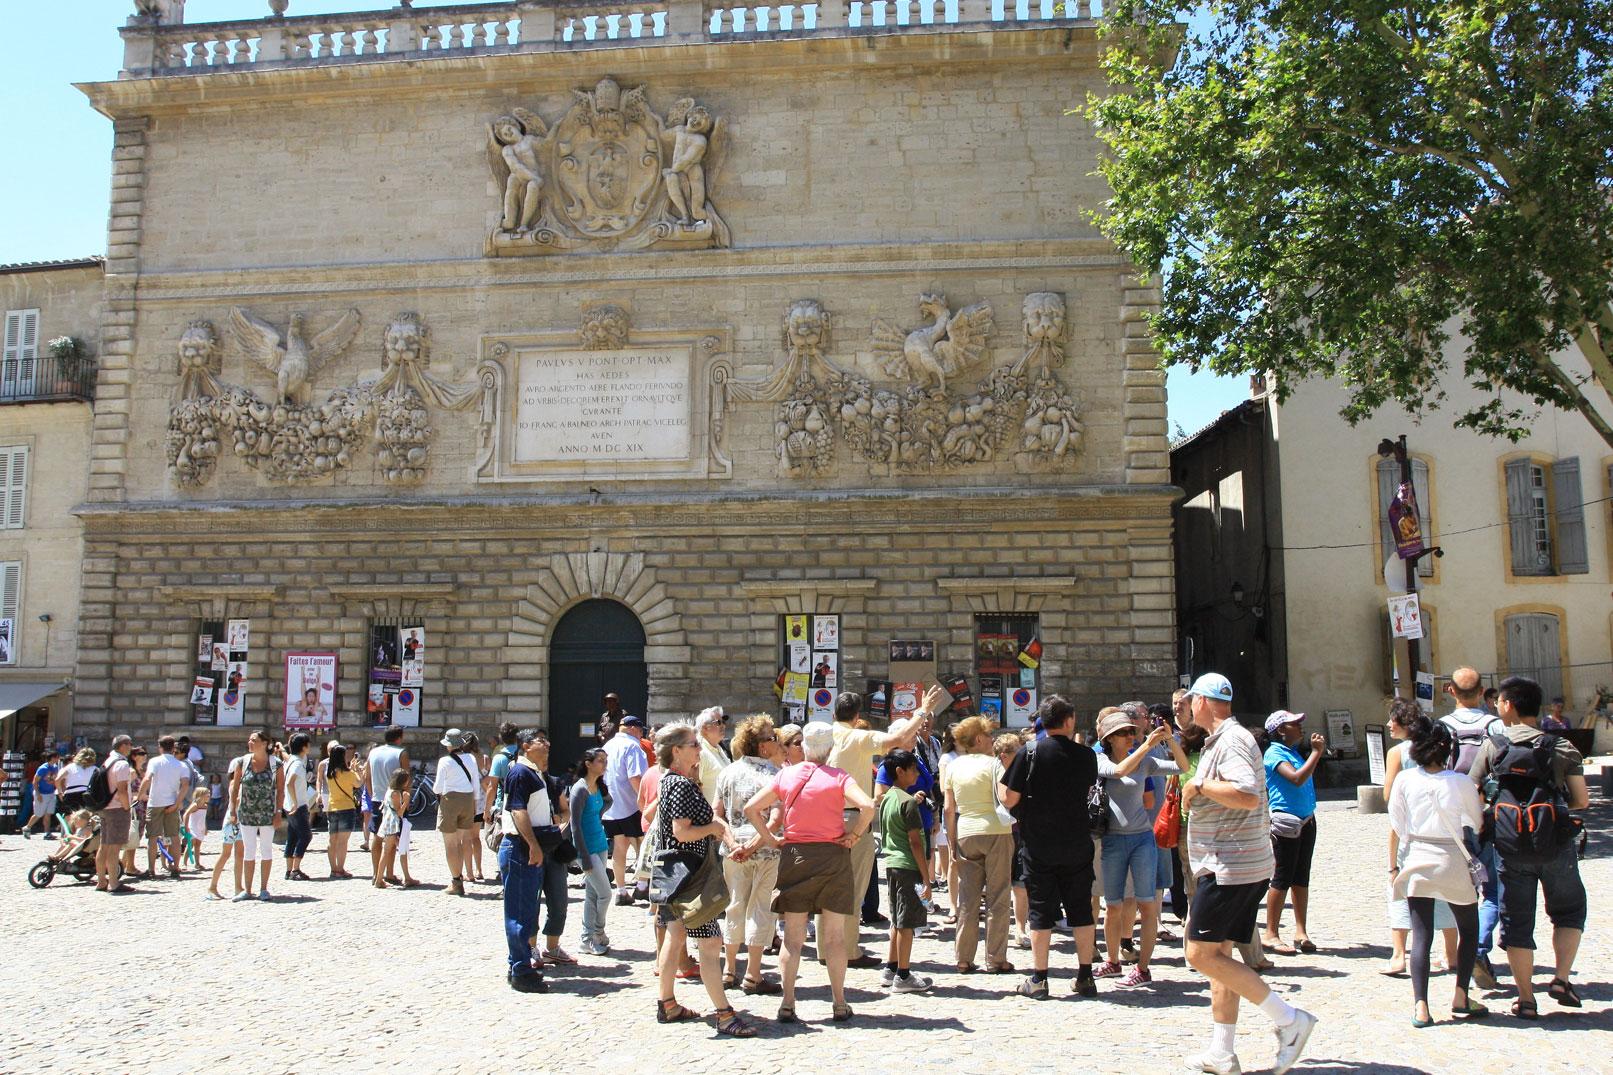 Tour guides in Vaucluse Provence © Hocquel